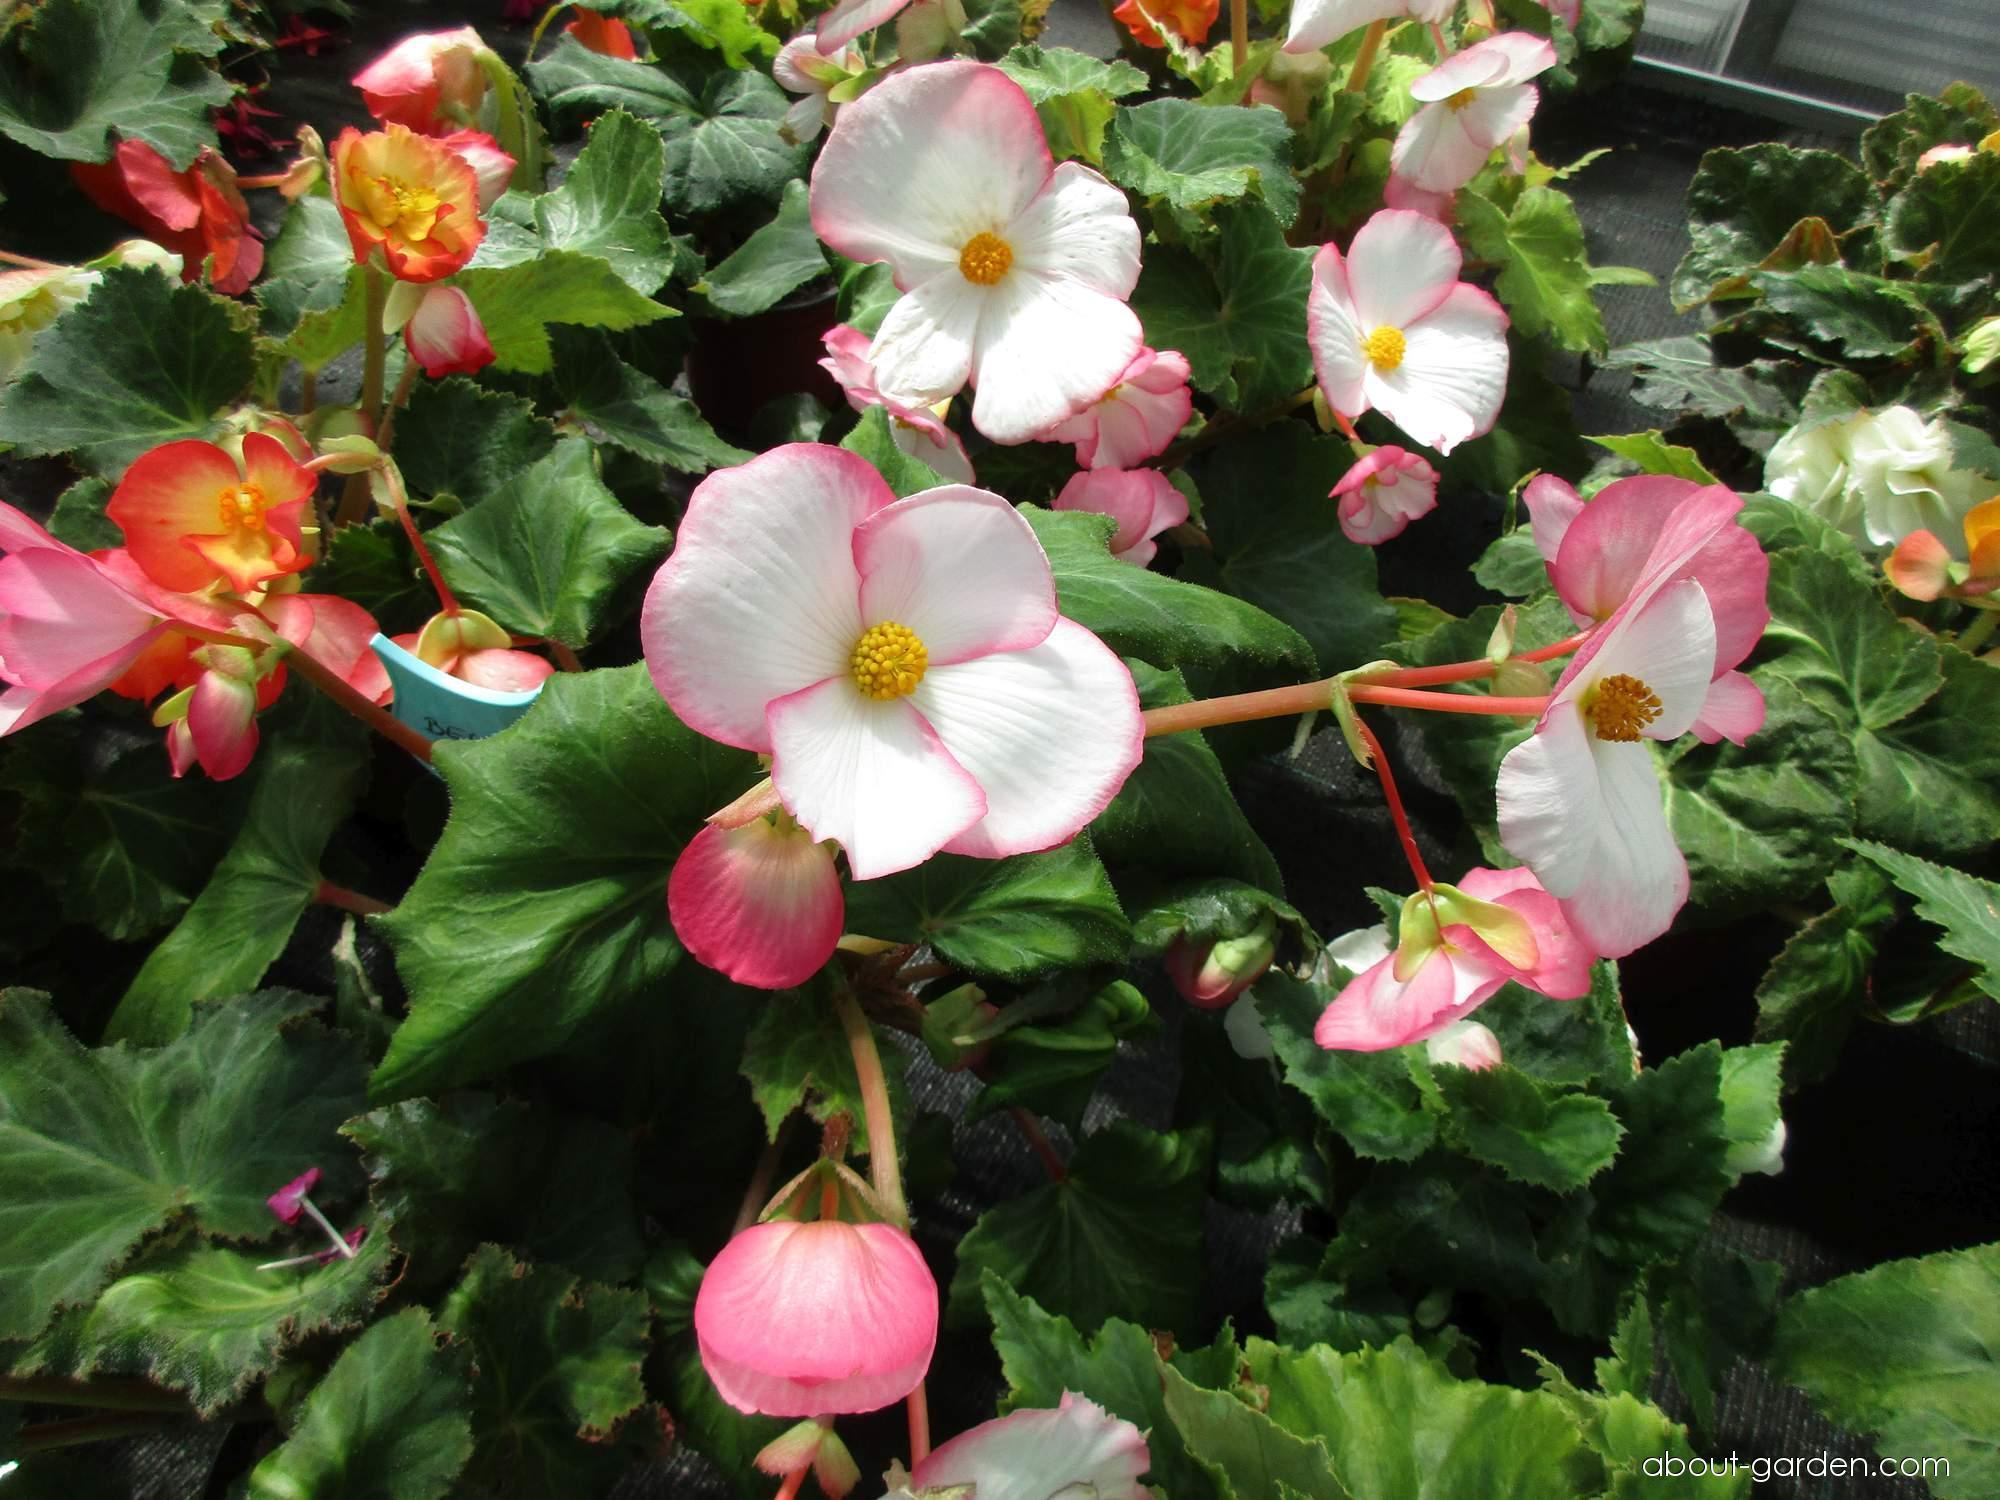 Tuberous begonia - Begonia x tuberhybrida